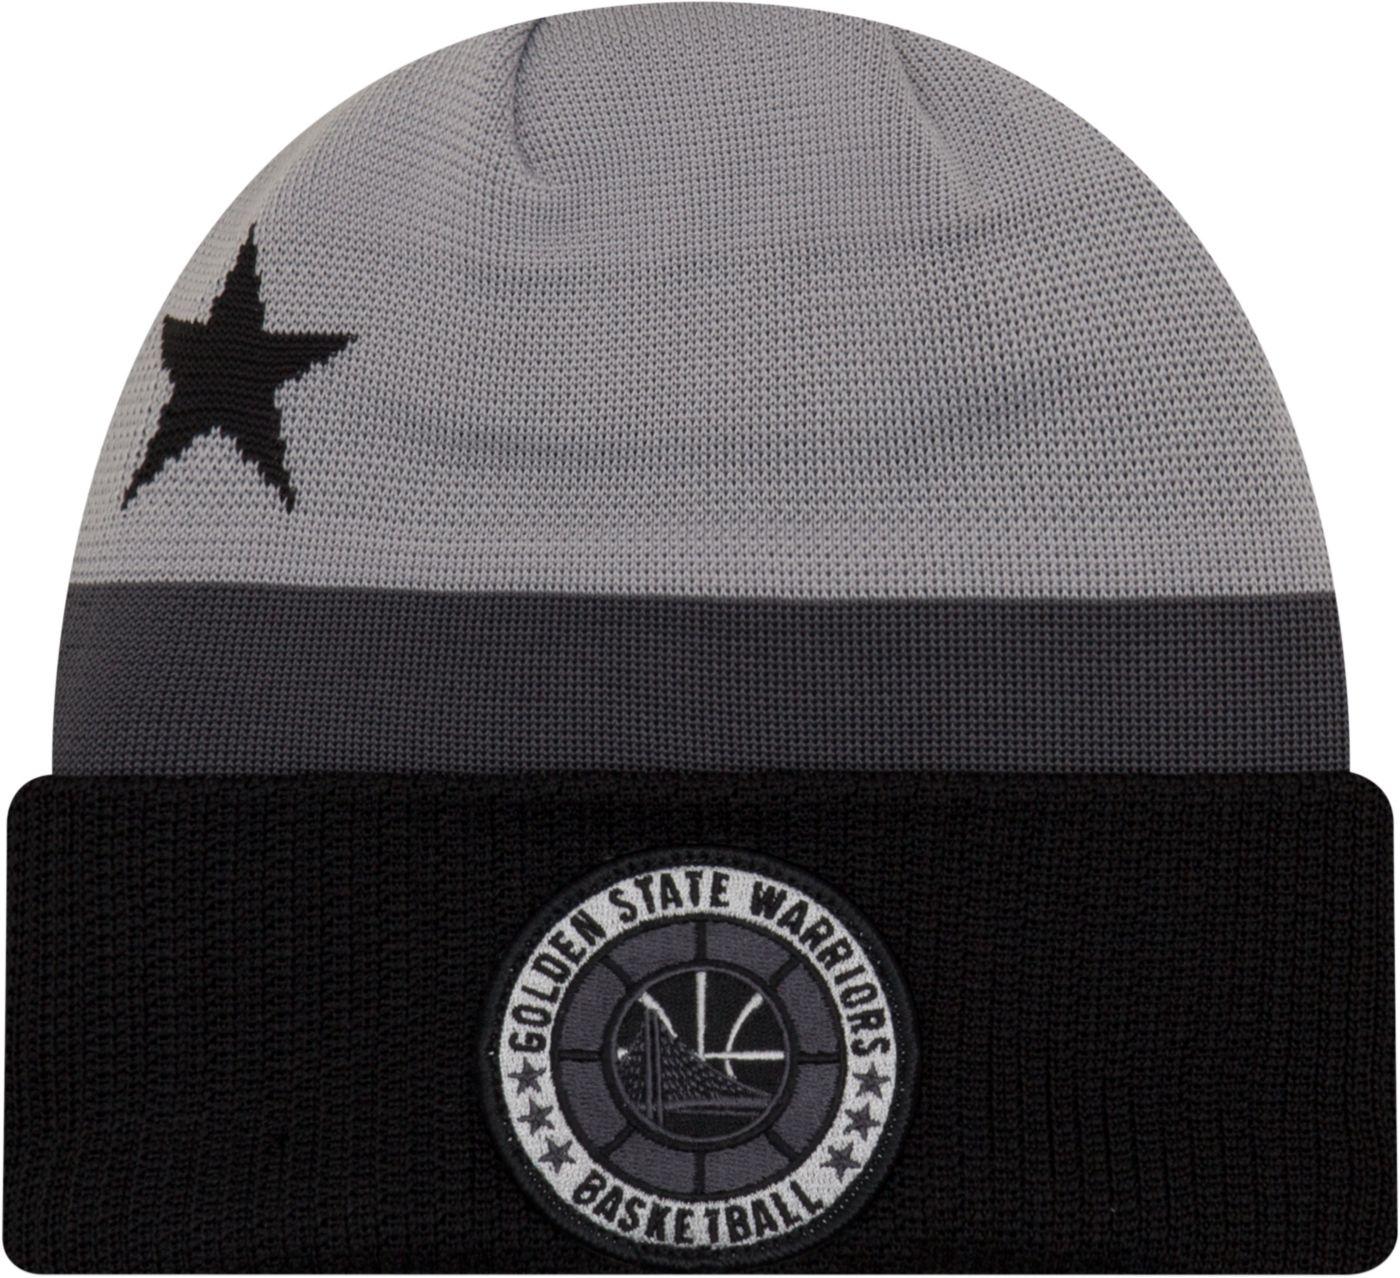 New Era Men's Golden State Warriors On-Court Knit Hat